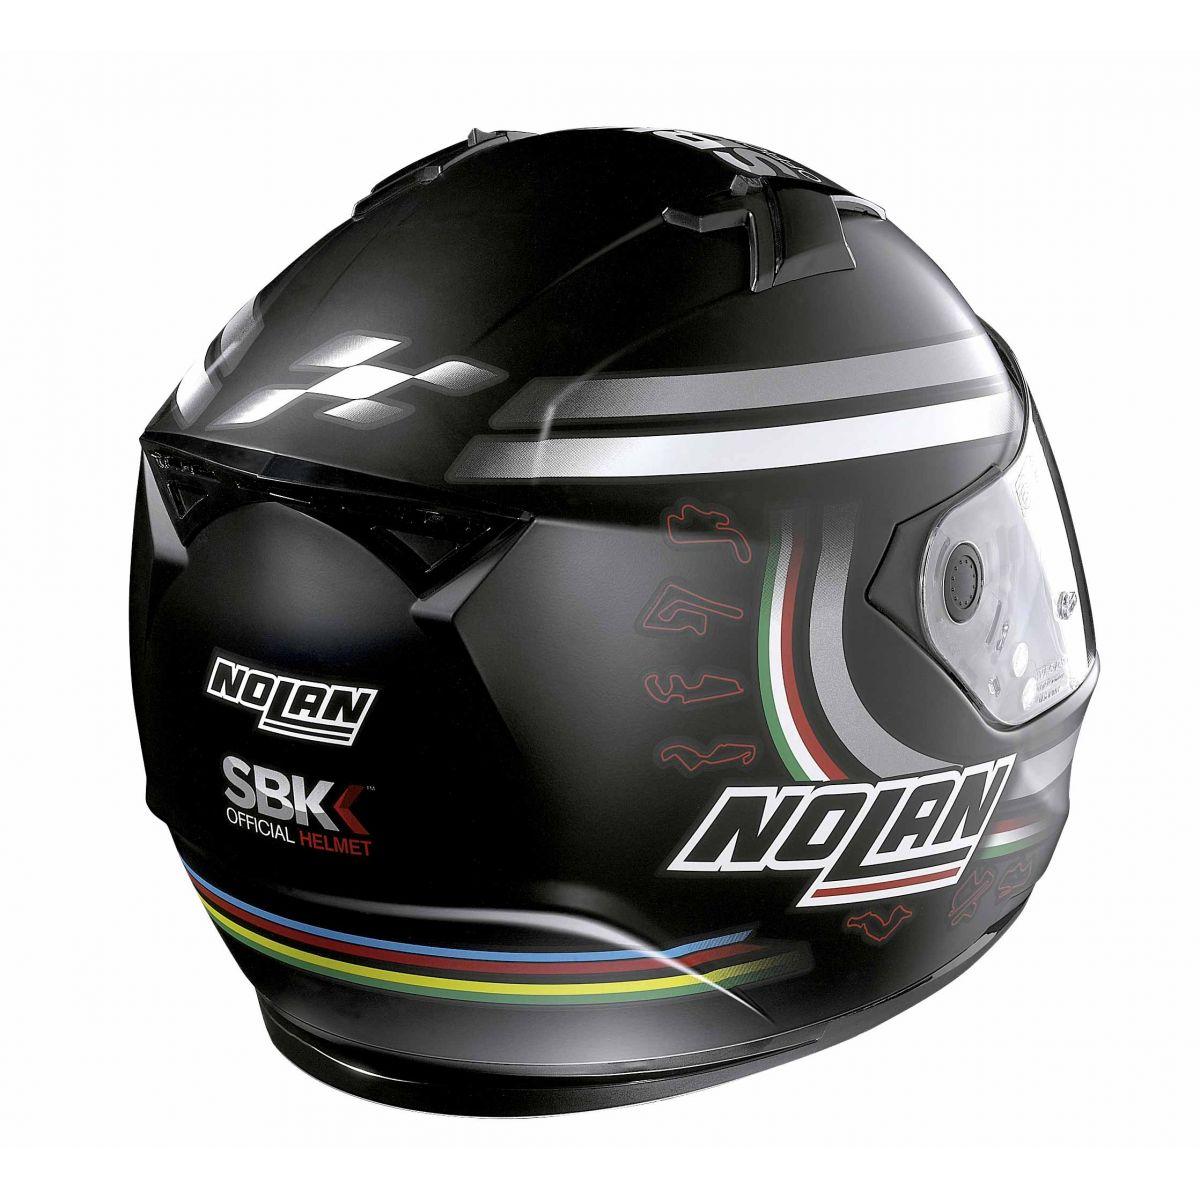 Capacete Nolan N64 Superbike SBK Flat Black - Ganhe Balaclava Exclusiva!  - Planet Bike Shop Moto Acessórios